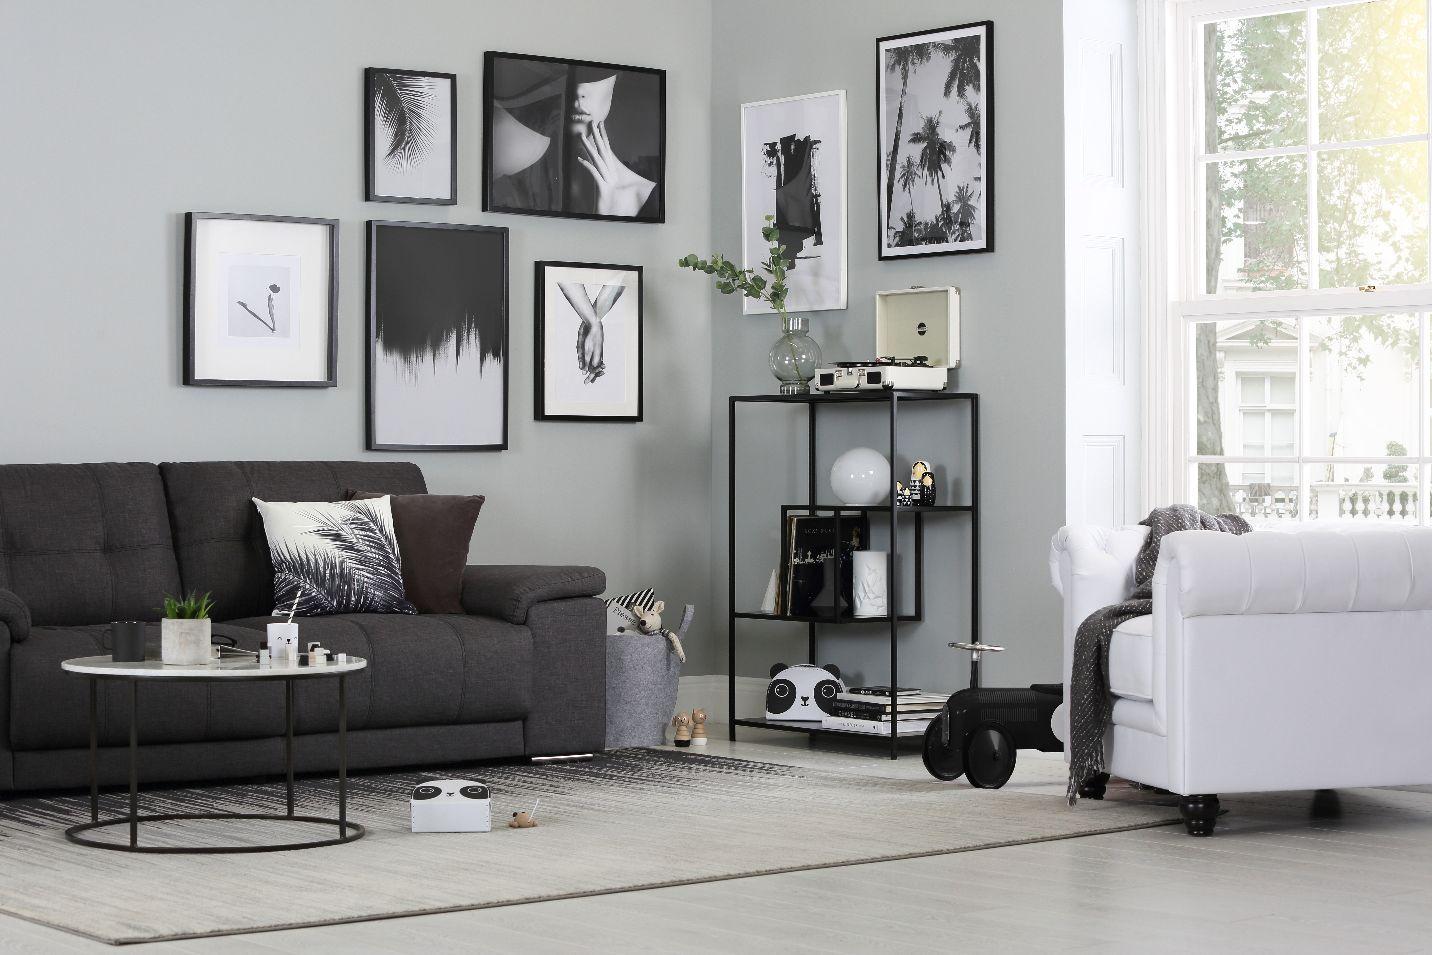 1furniture-choice-ltd_fc-kansas-slate-2-seater-al399.99-www.furniturechoice.co_.uk_.jpg